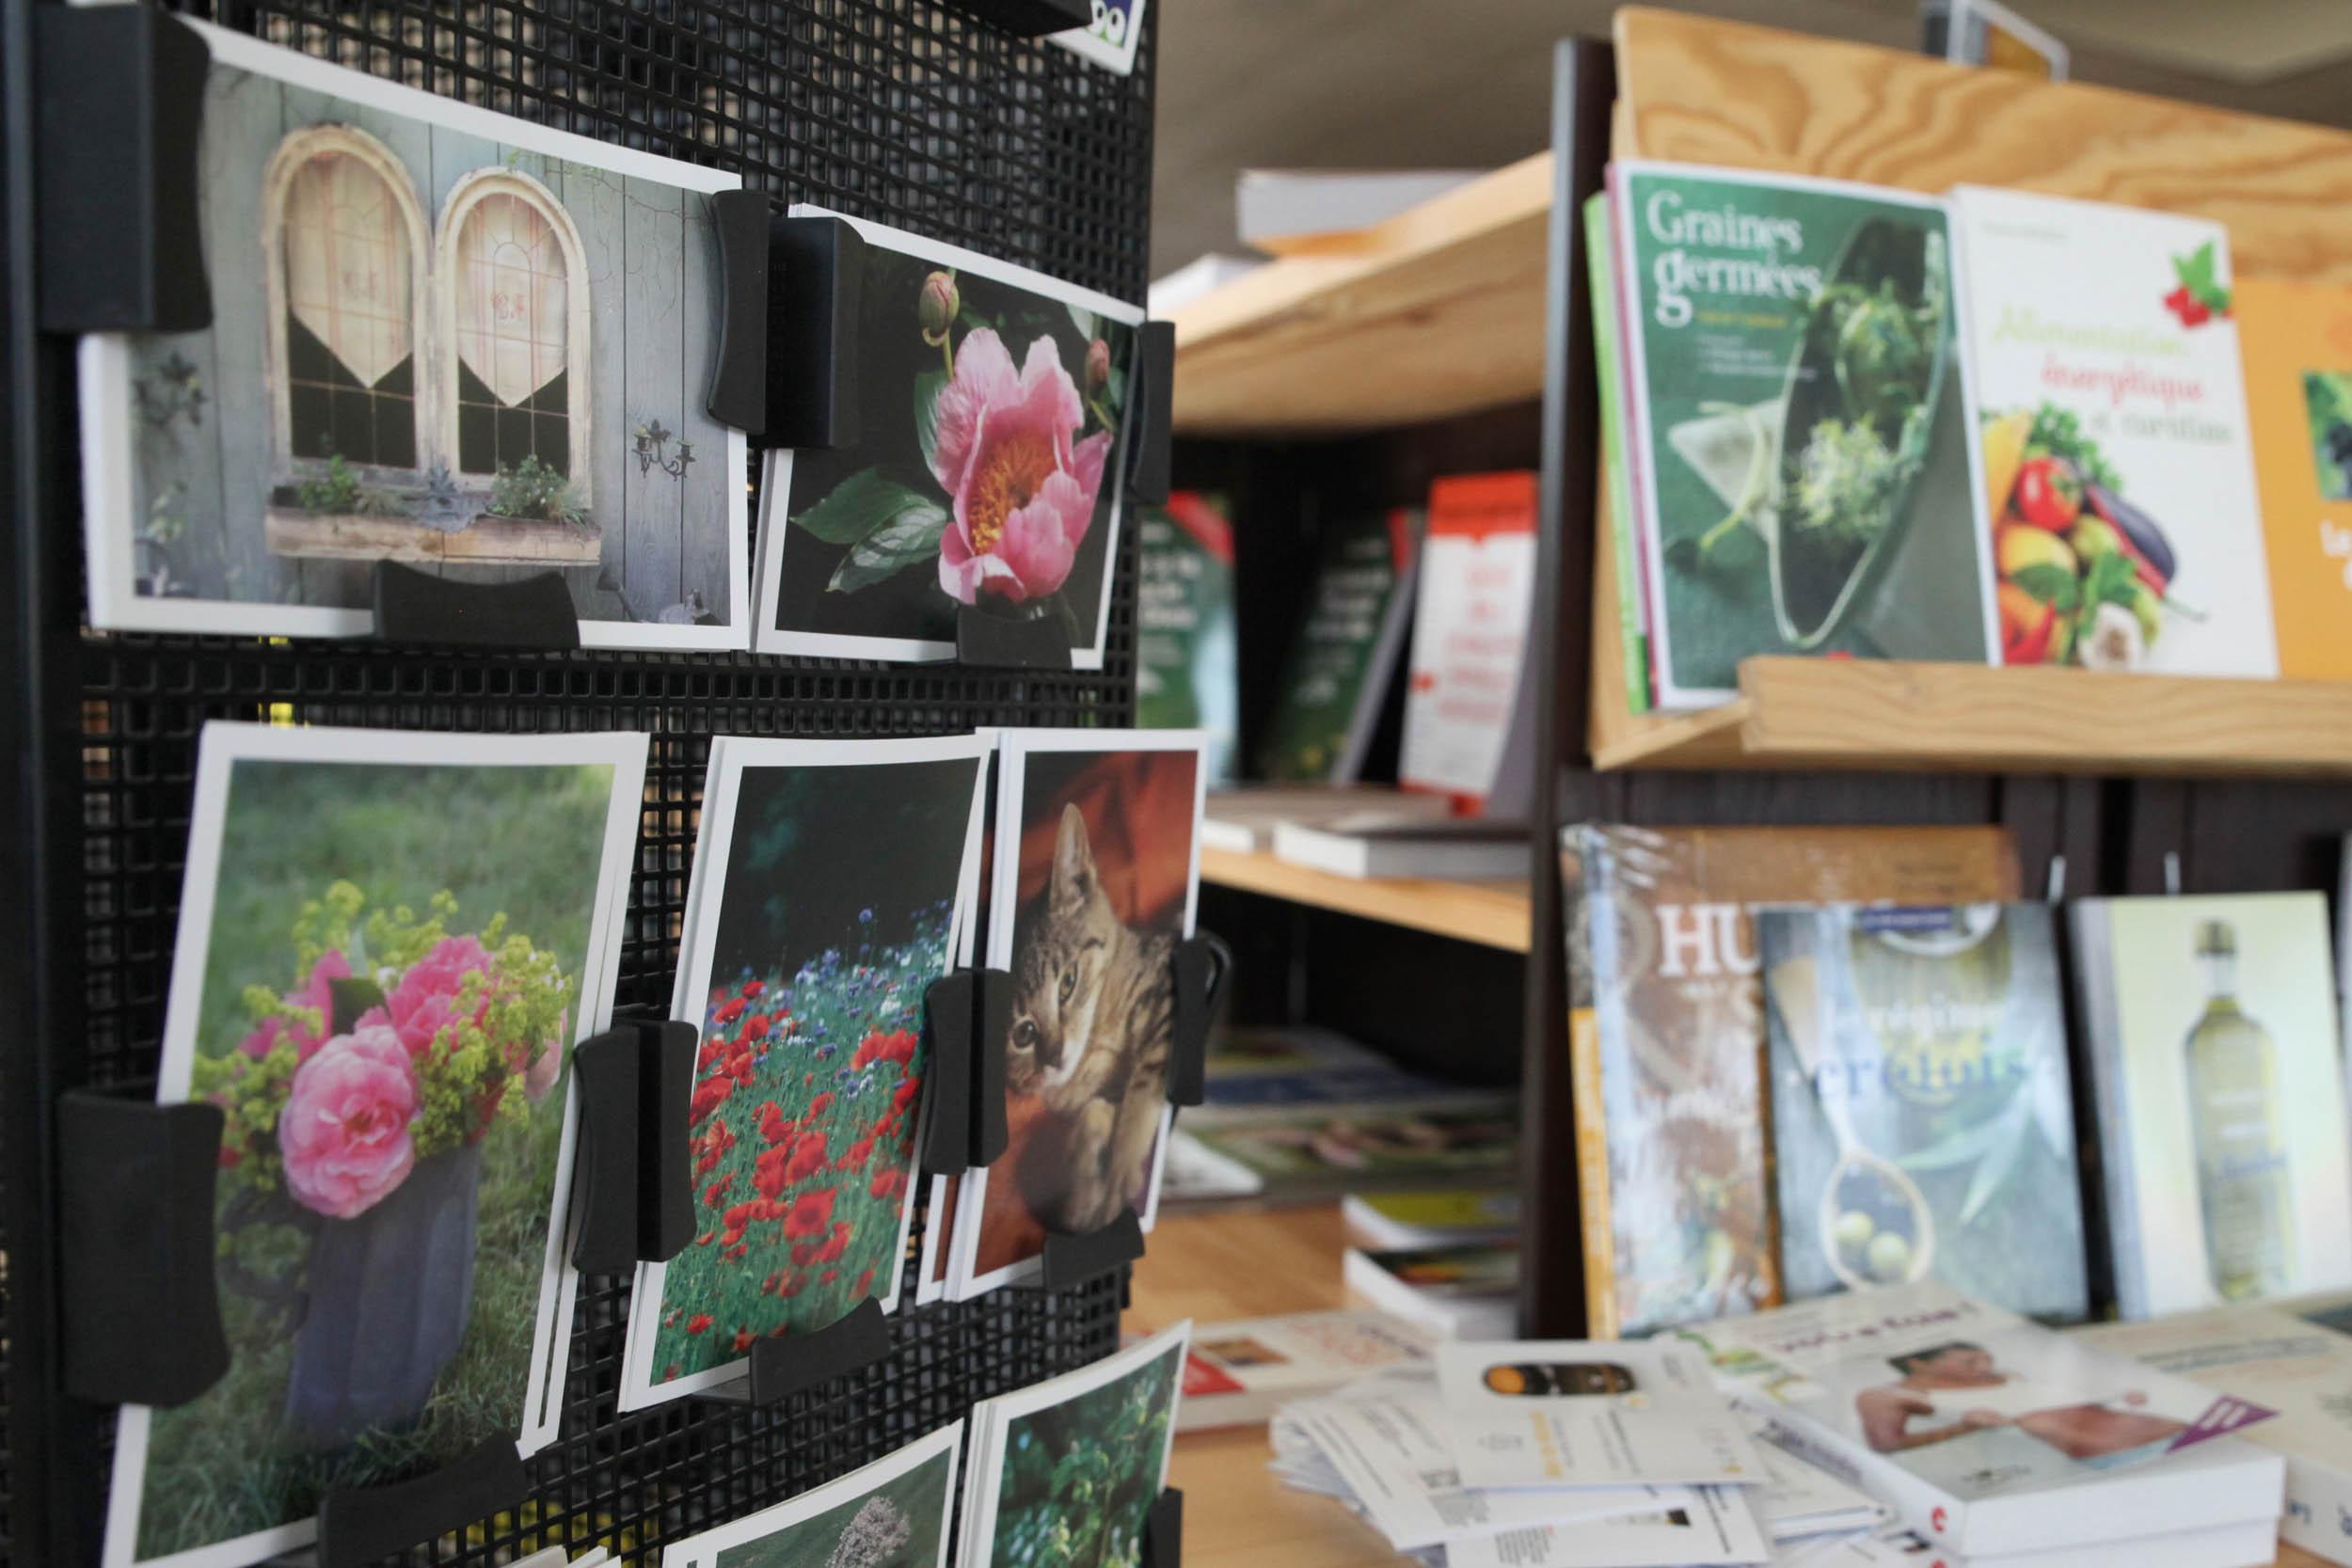 carte postale librairie arbrea papillon souffel.jpg